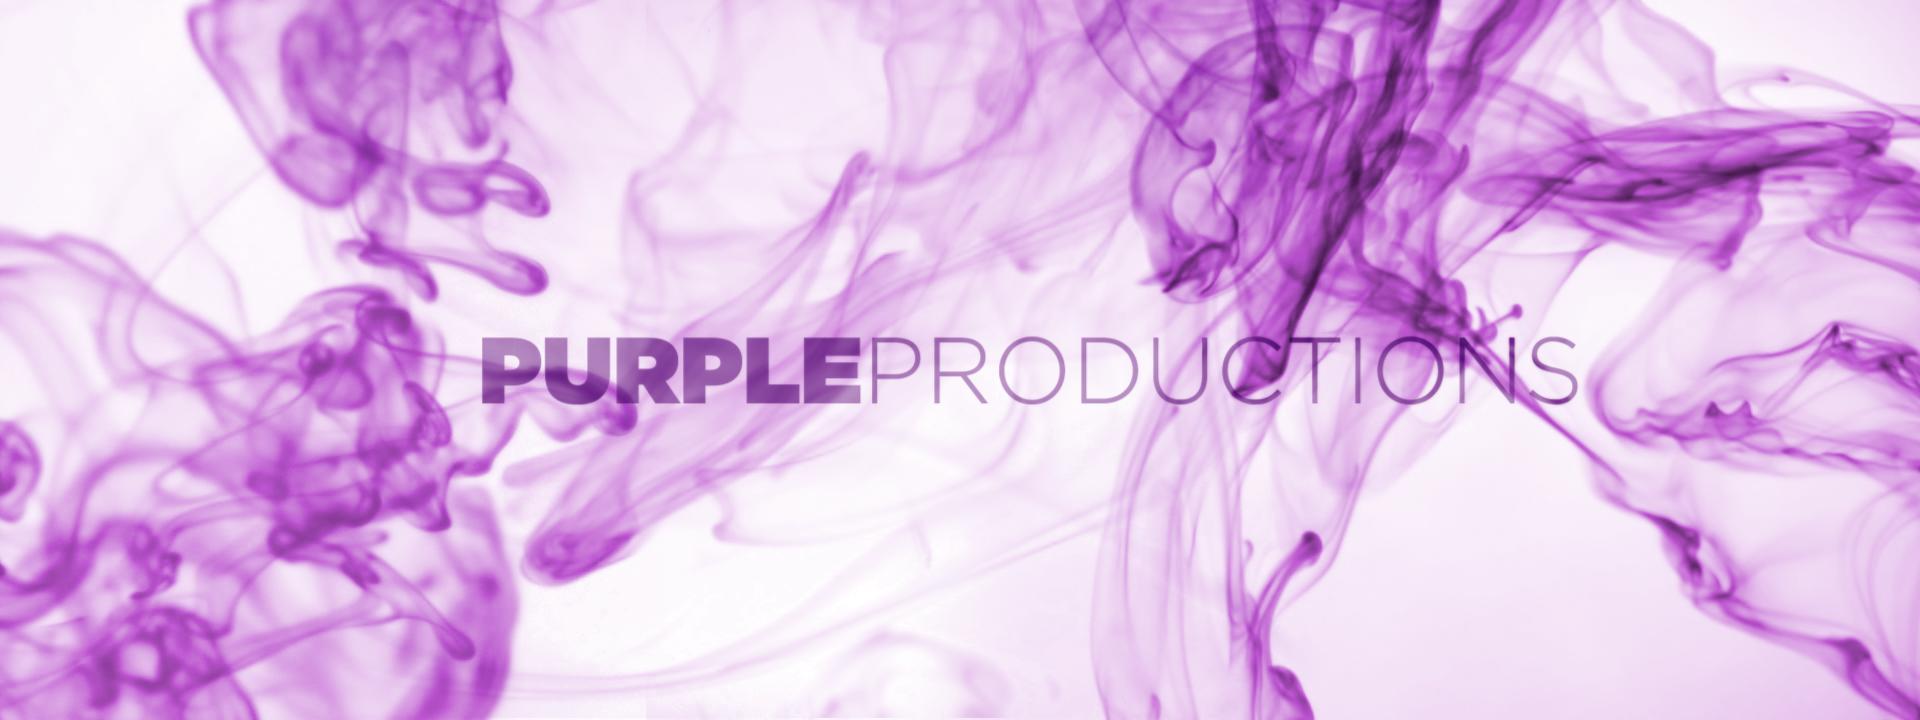 Purple Productions